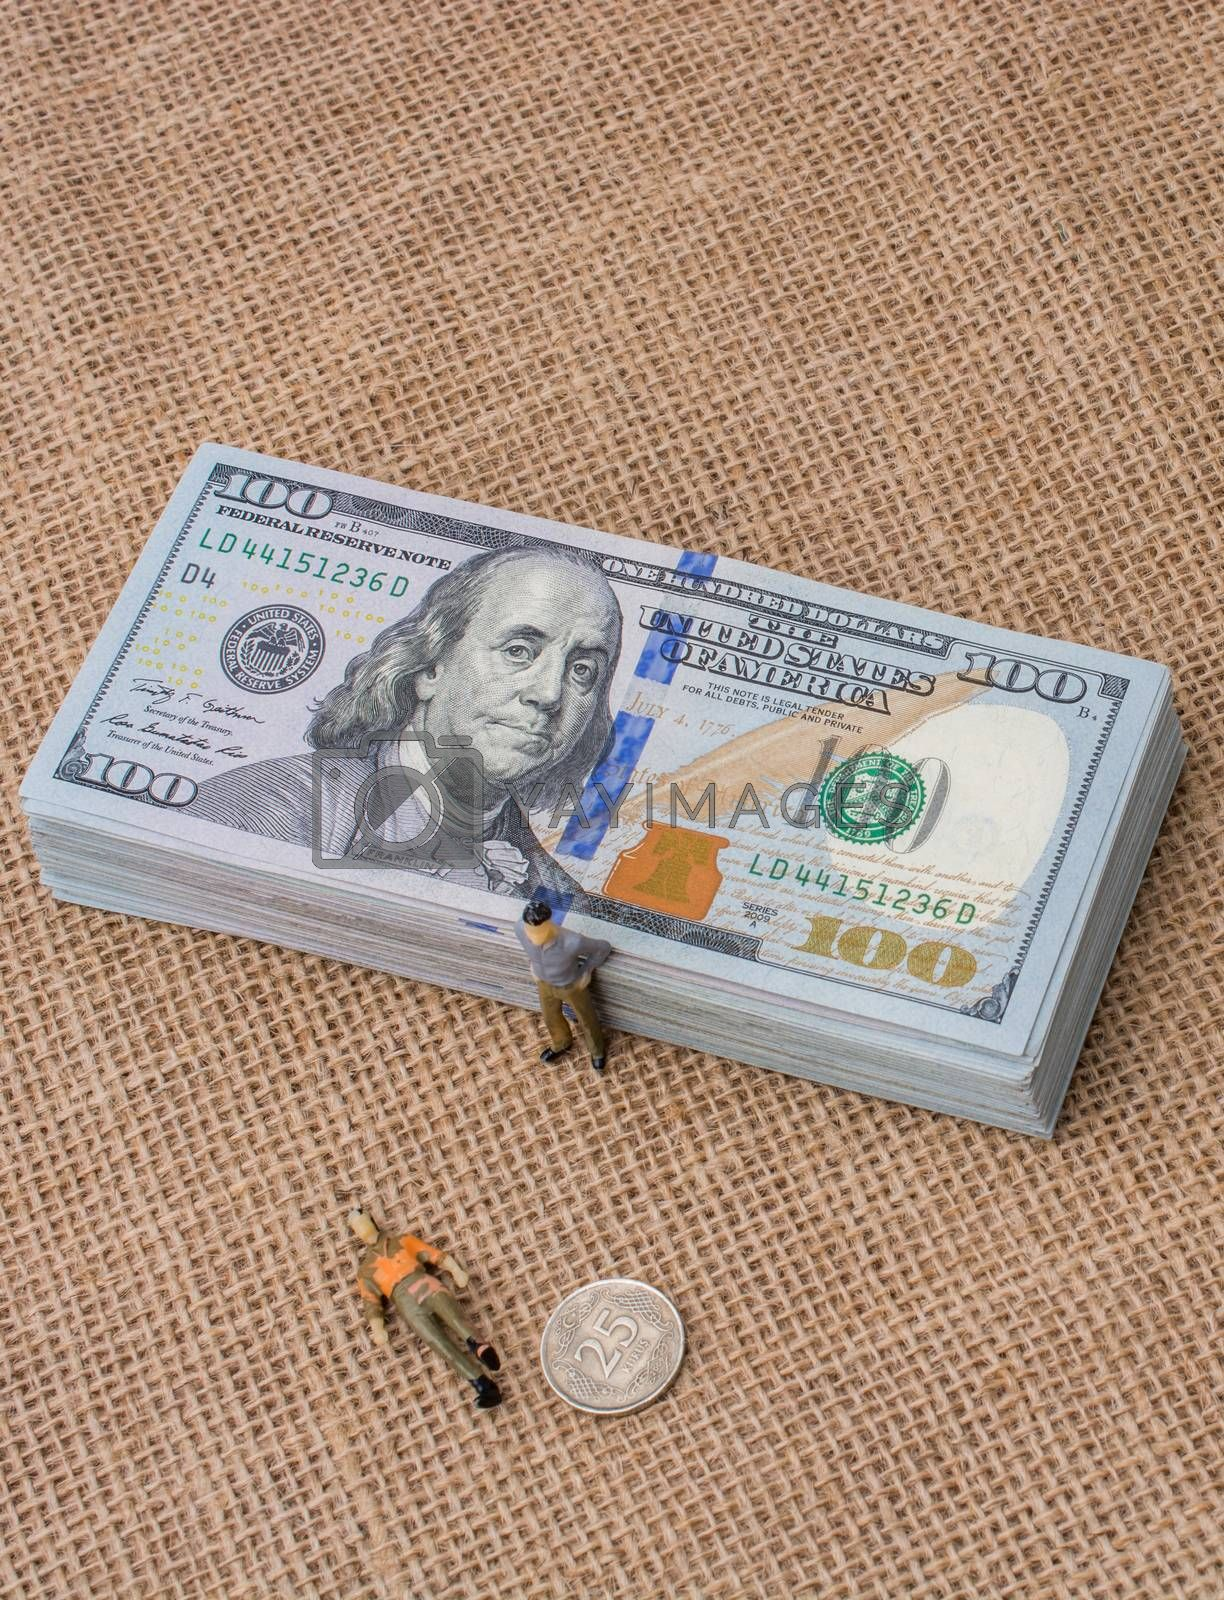 Men figurines found beside the bundle of US dollar banknote